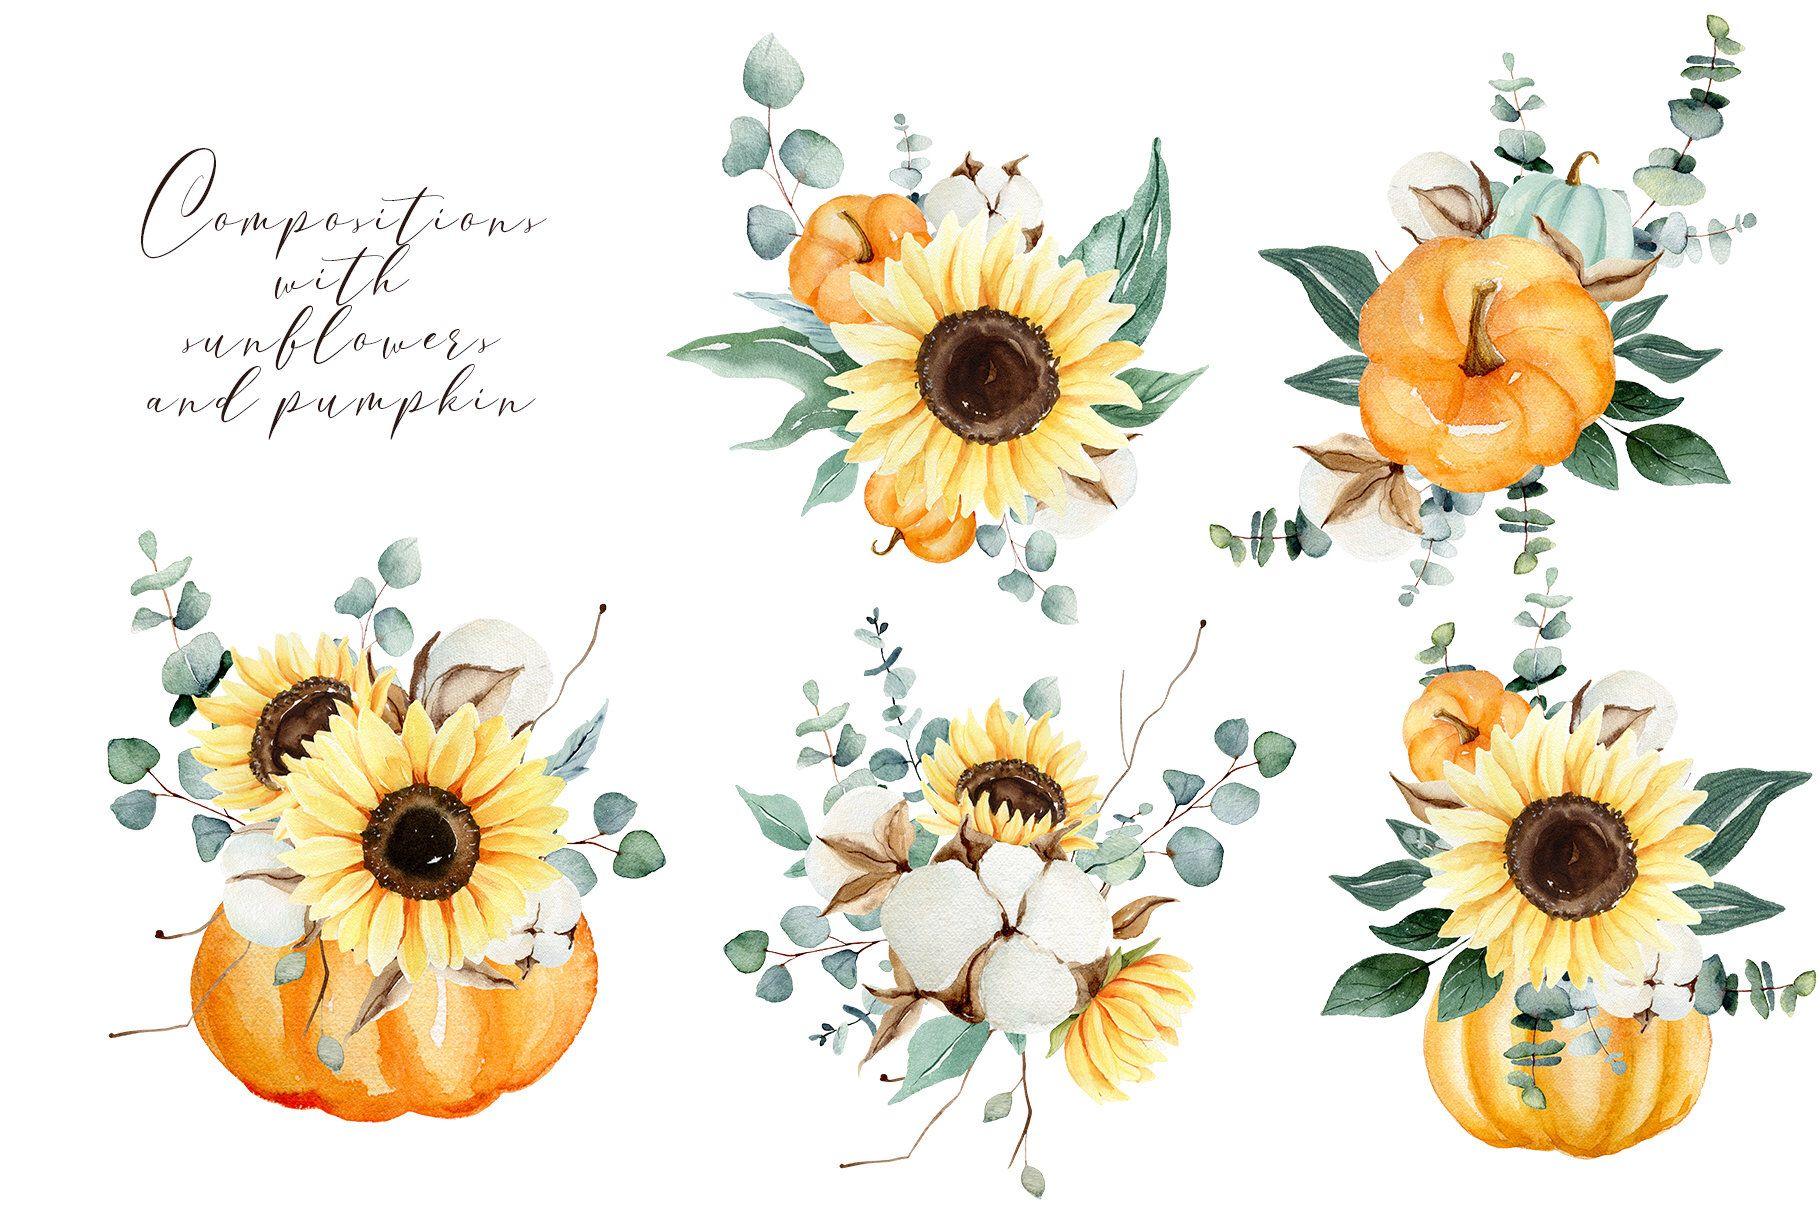 Sunflower Png Pumpkin Png Eucalyptus With Sunflower Clipart Etsy In 2021 Sunflower Clipart Watercolor Sunflower Sunflower Png